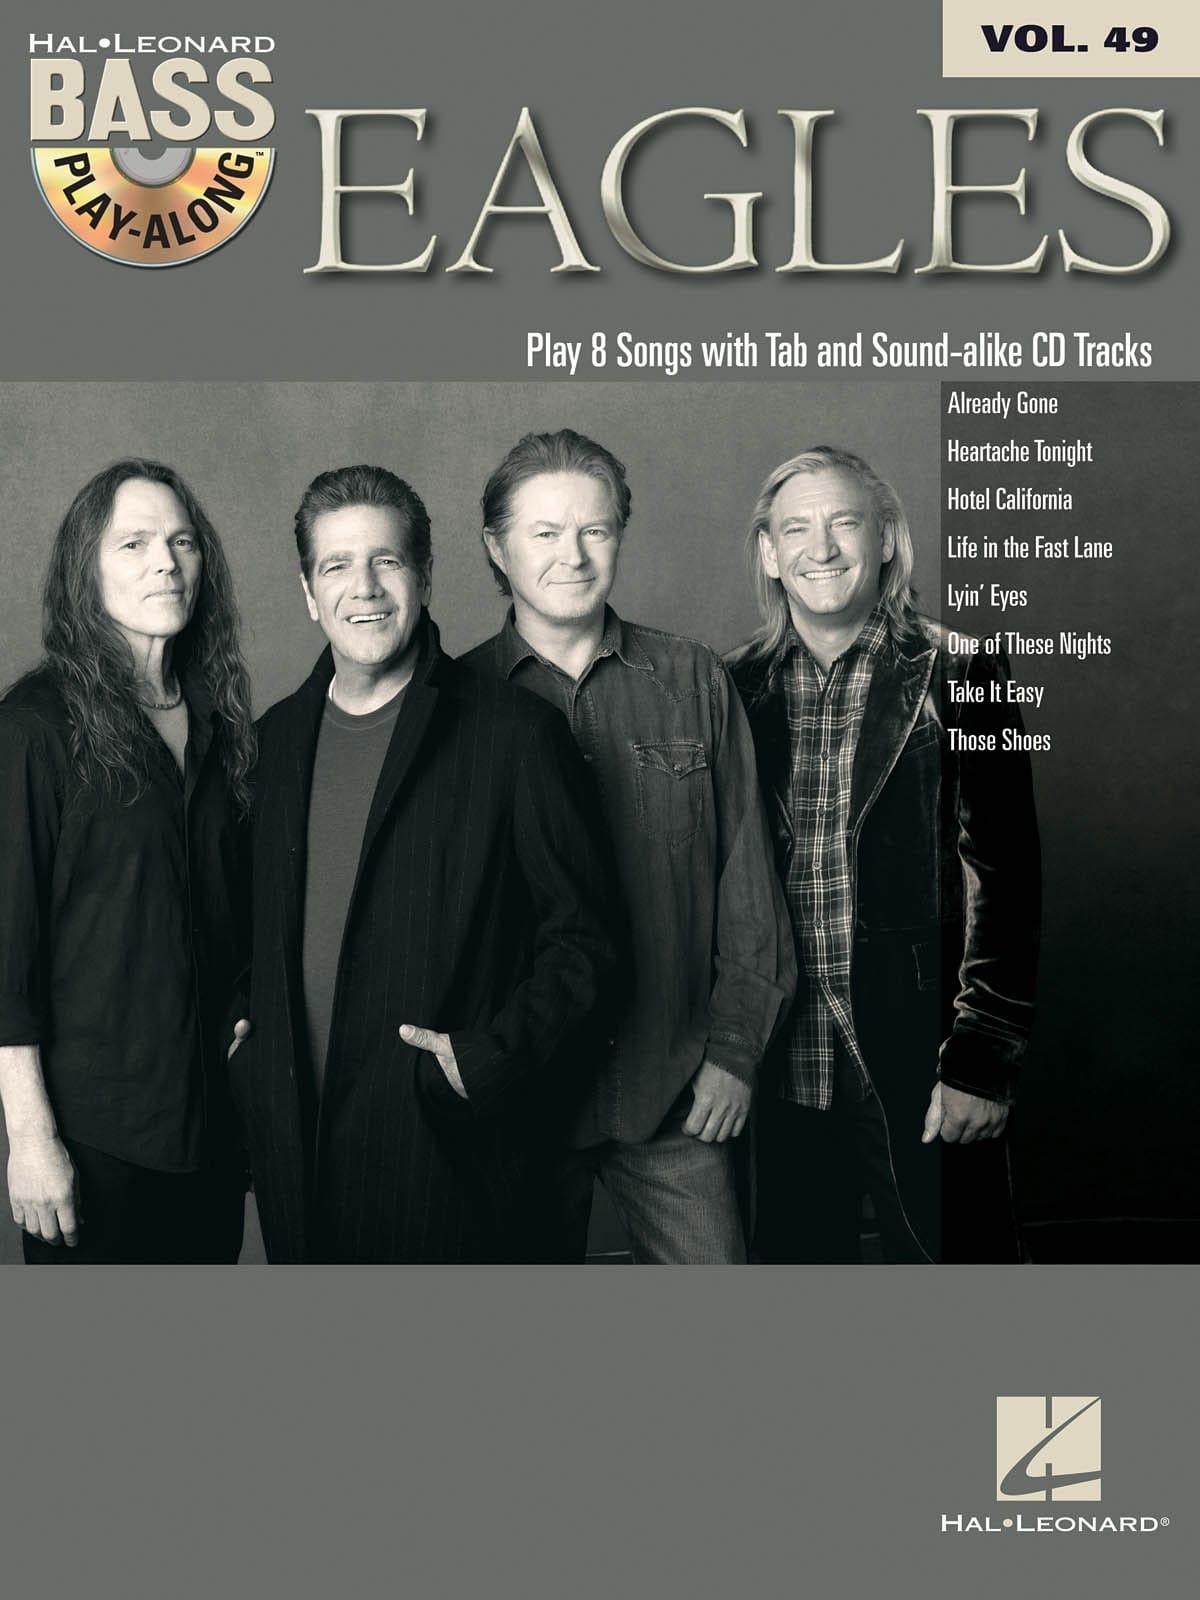 Bass Play-Along Volume 49 - Eagles - Eagles - laflutedepan.com